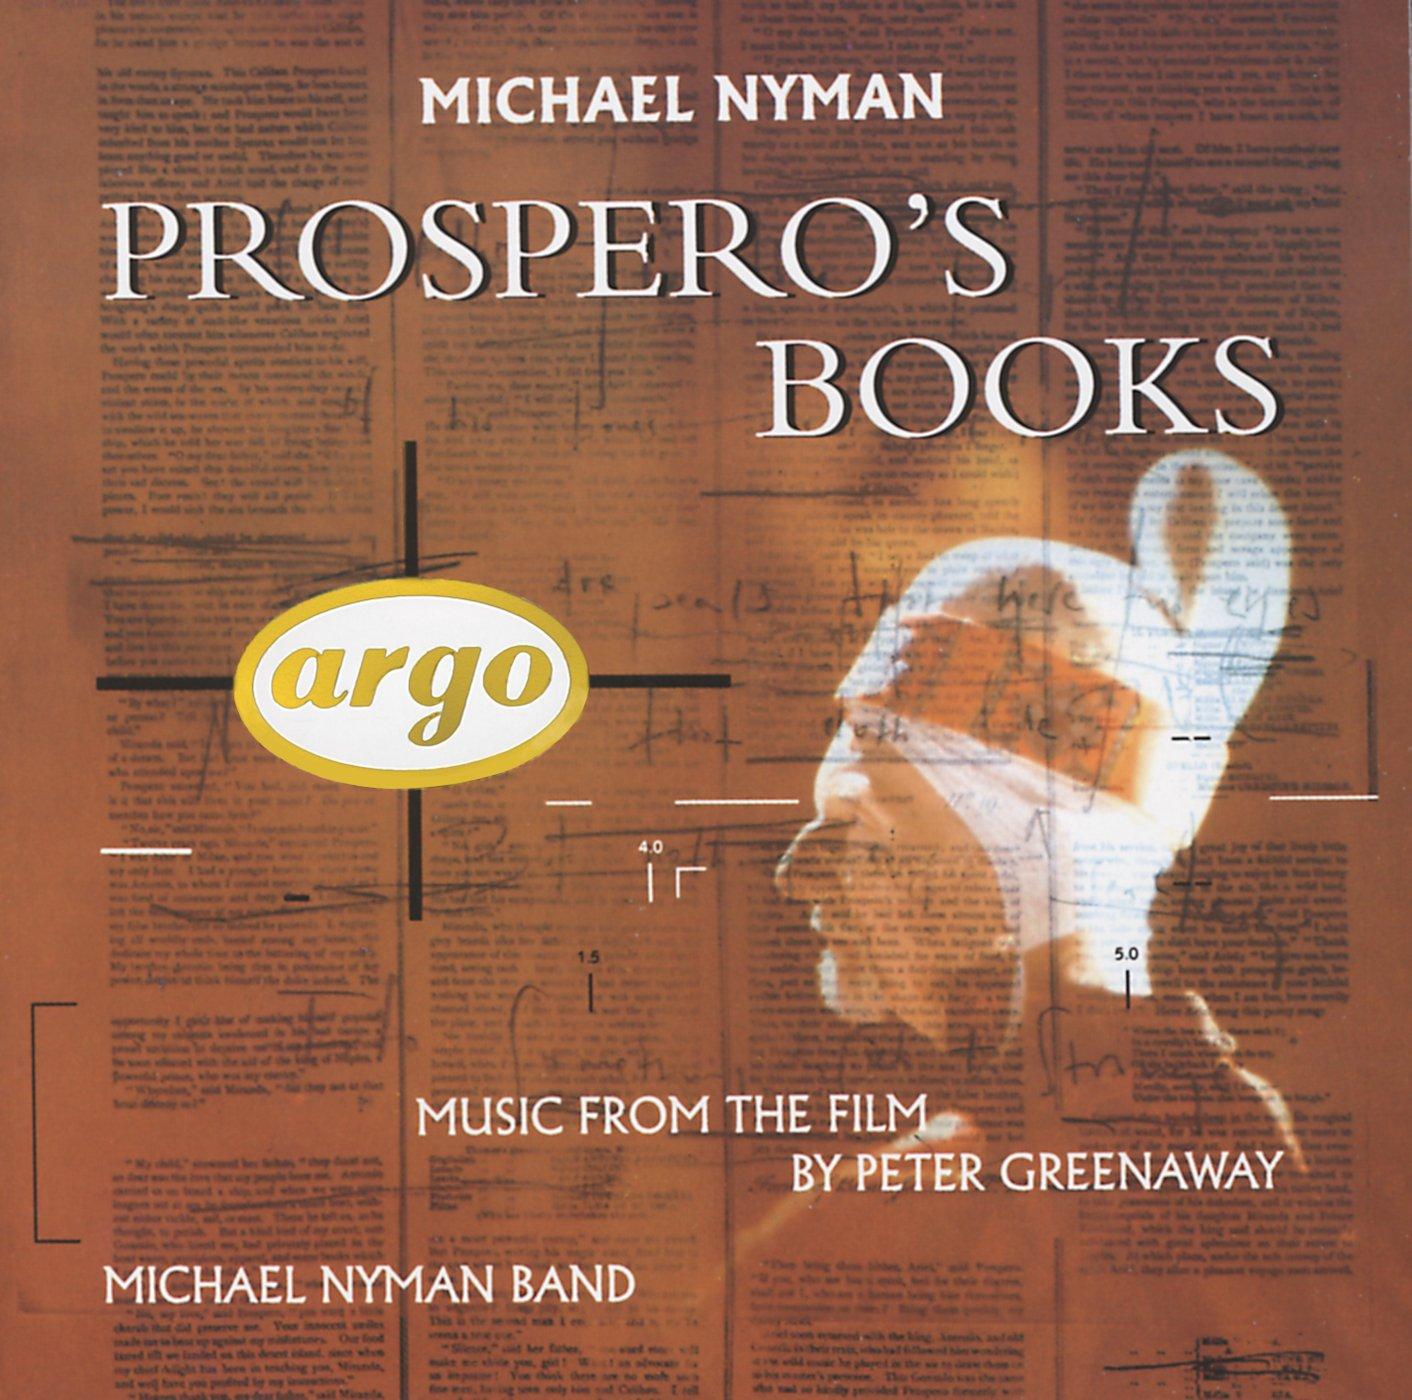 Michael Nyman - Prospero's Books (1991) [FLAC] Download